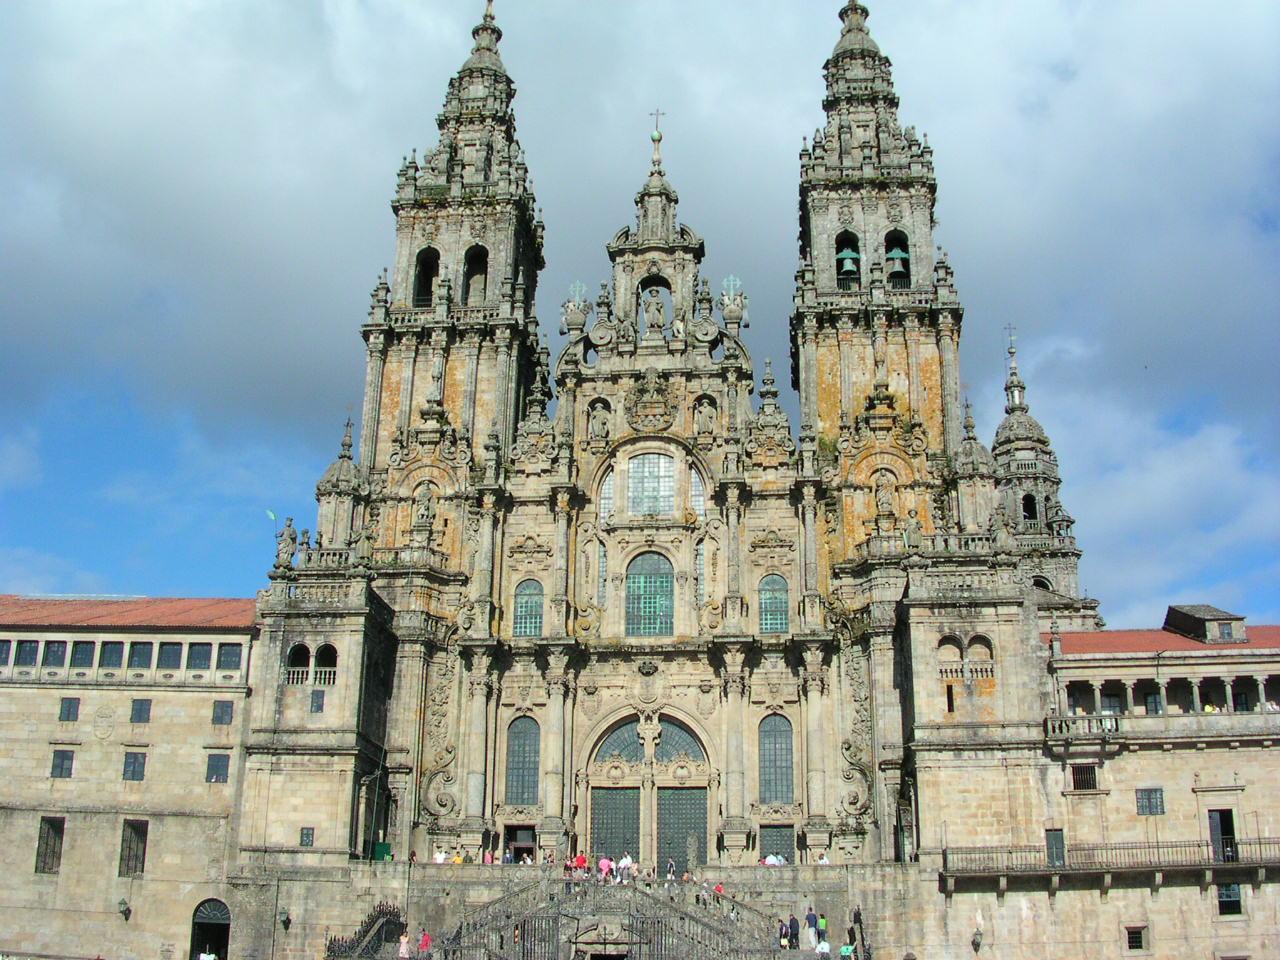 File:Catedral de Santiago de Compostela. Agosto 2005..JPG - Wikimedia Commons